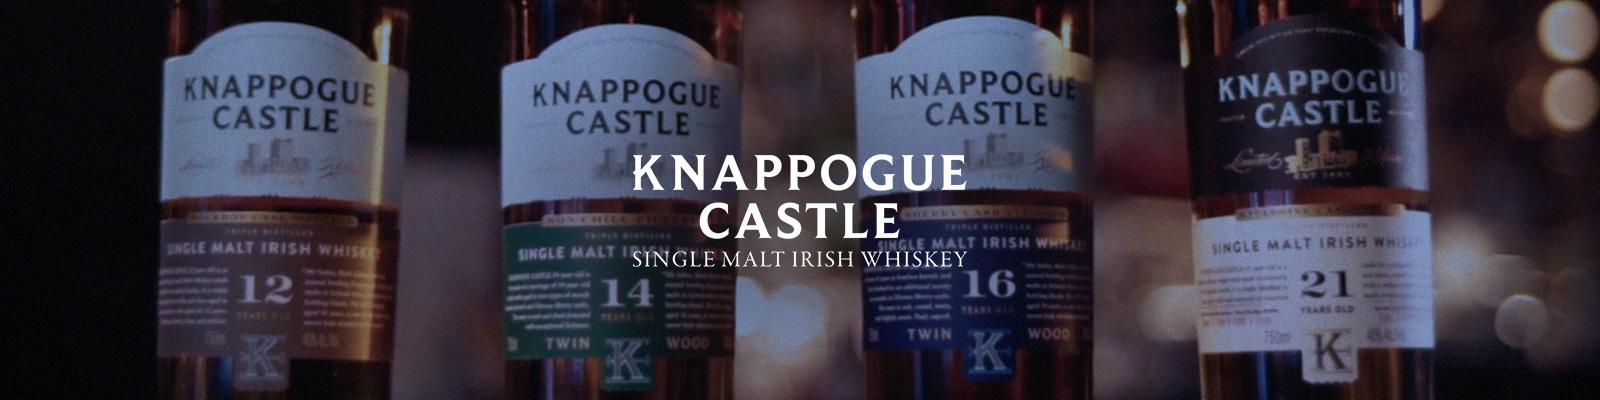 Knappogue Whiskey